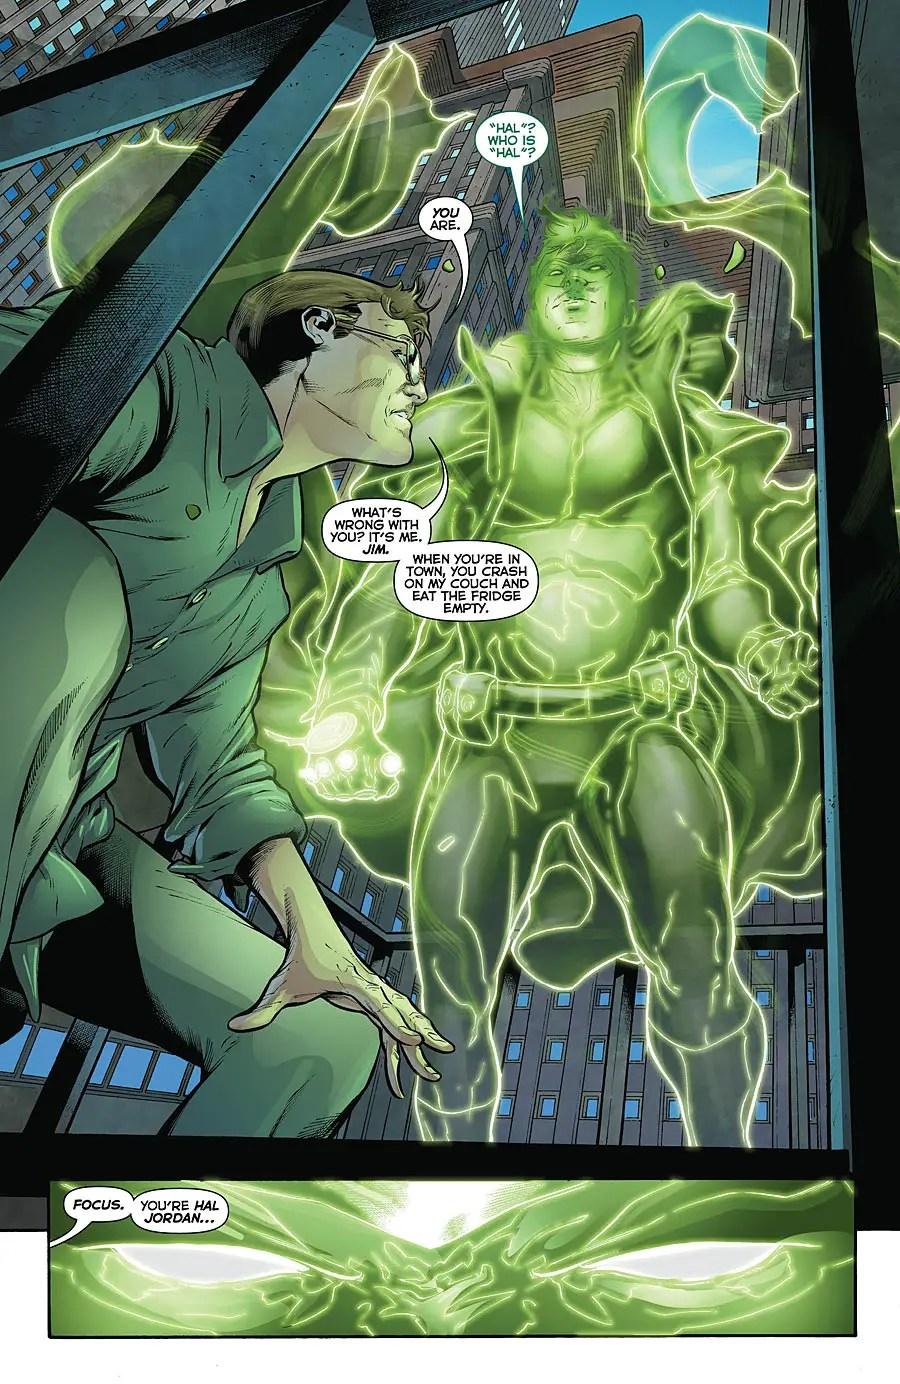 green-lantern-51-hal-jordan